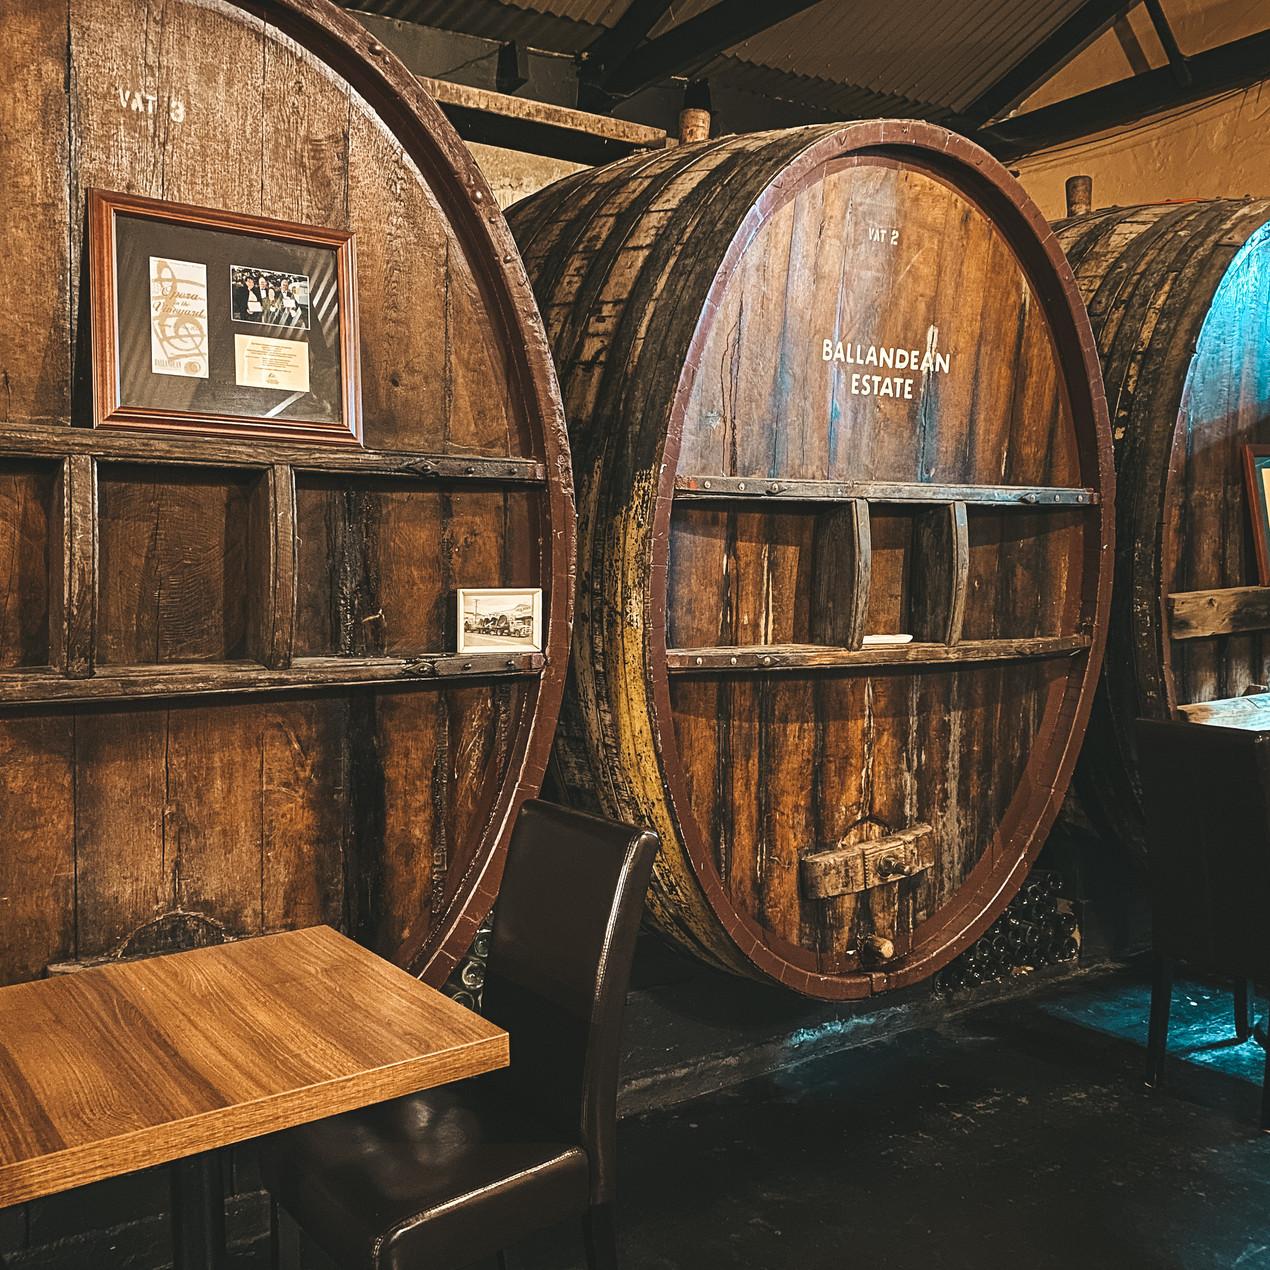 The Barrelroom Ballendean Estate winery Stanthorpe